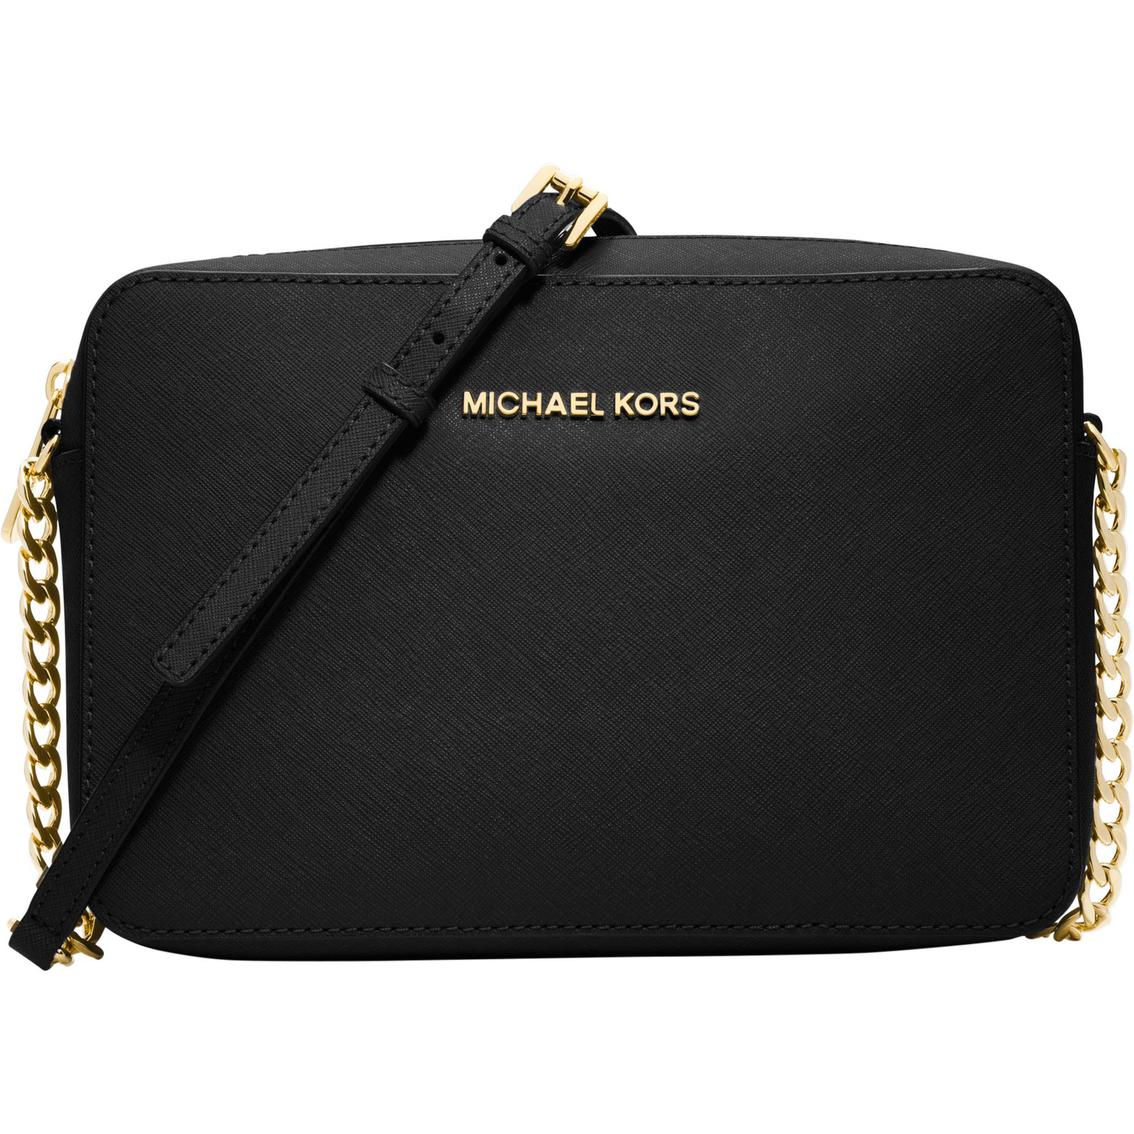 michael kors big crossbody bag